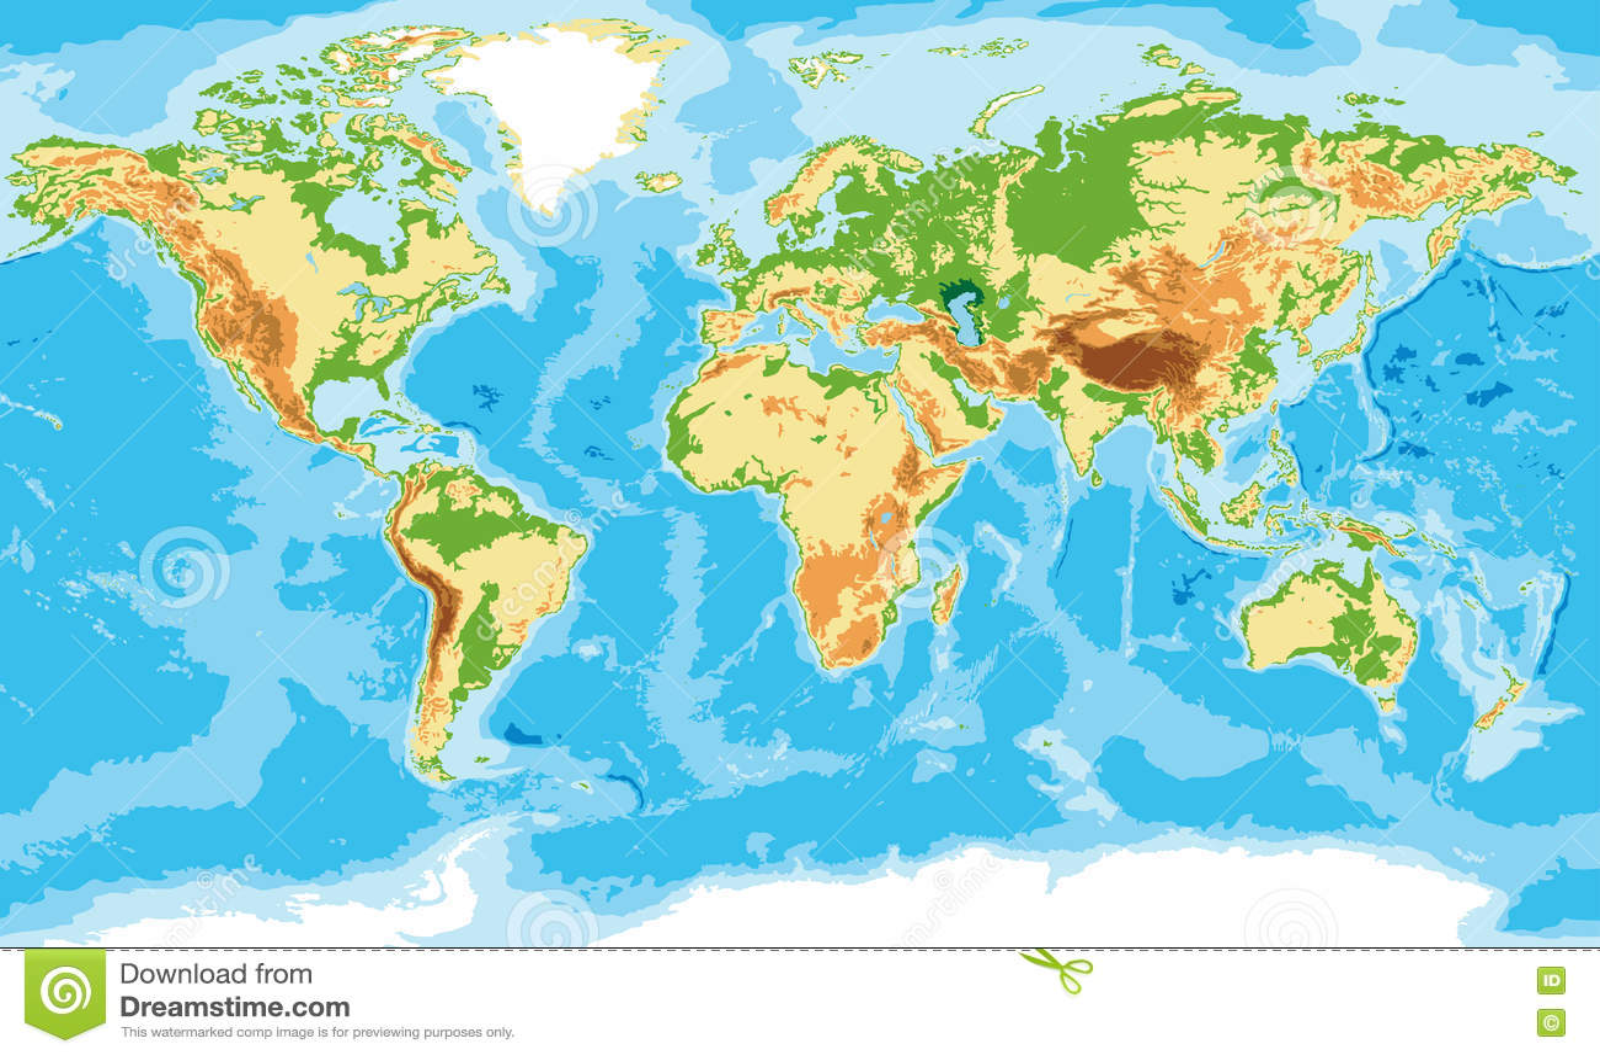 Mapa Físico Del Mundo.Mapa Fisico Del Mundo Ilustracion Del Vector Ilustracion De